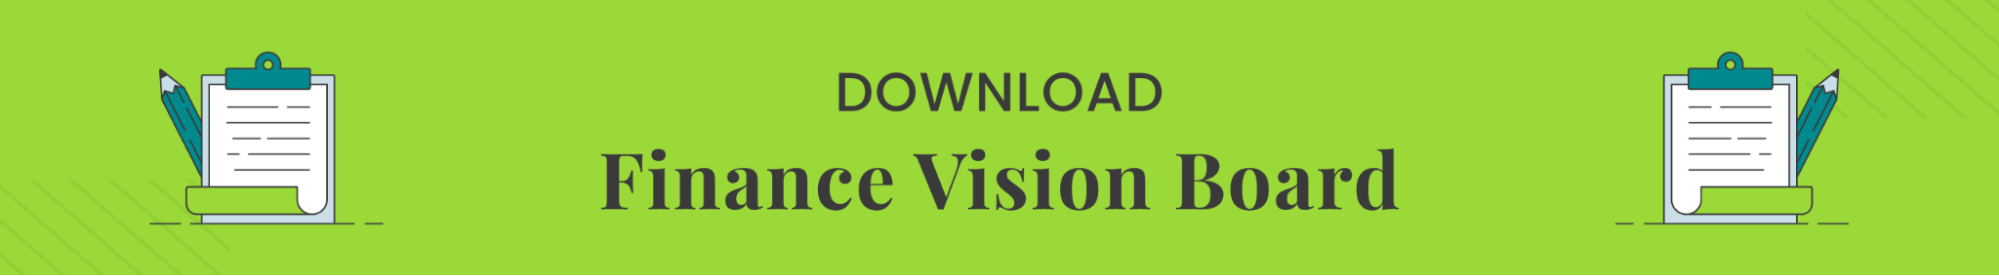 Download Finance Vision Board